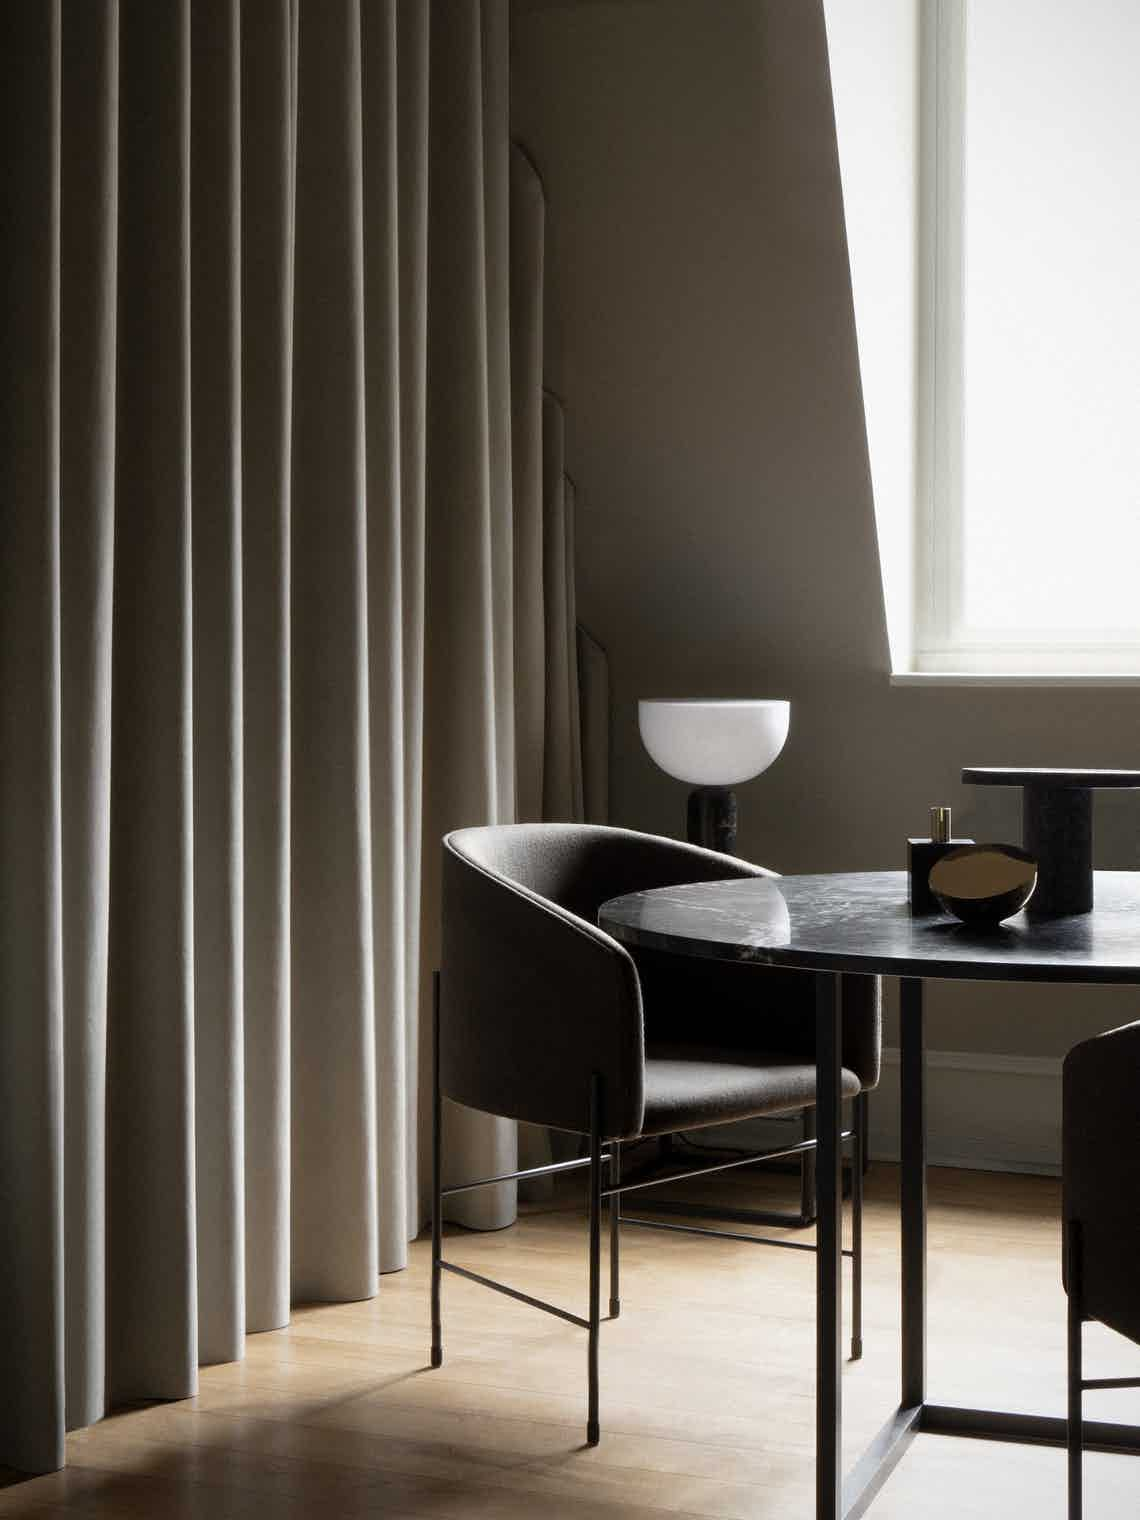 Shop new works furniture design at haute living chicago